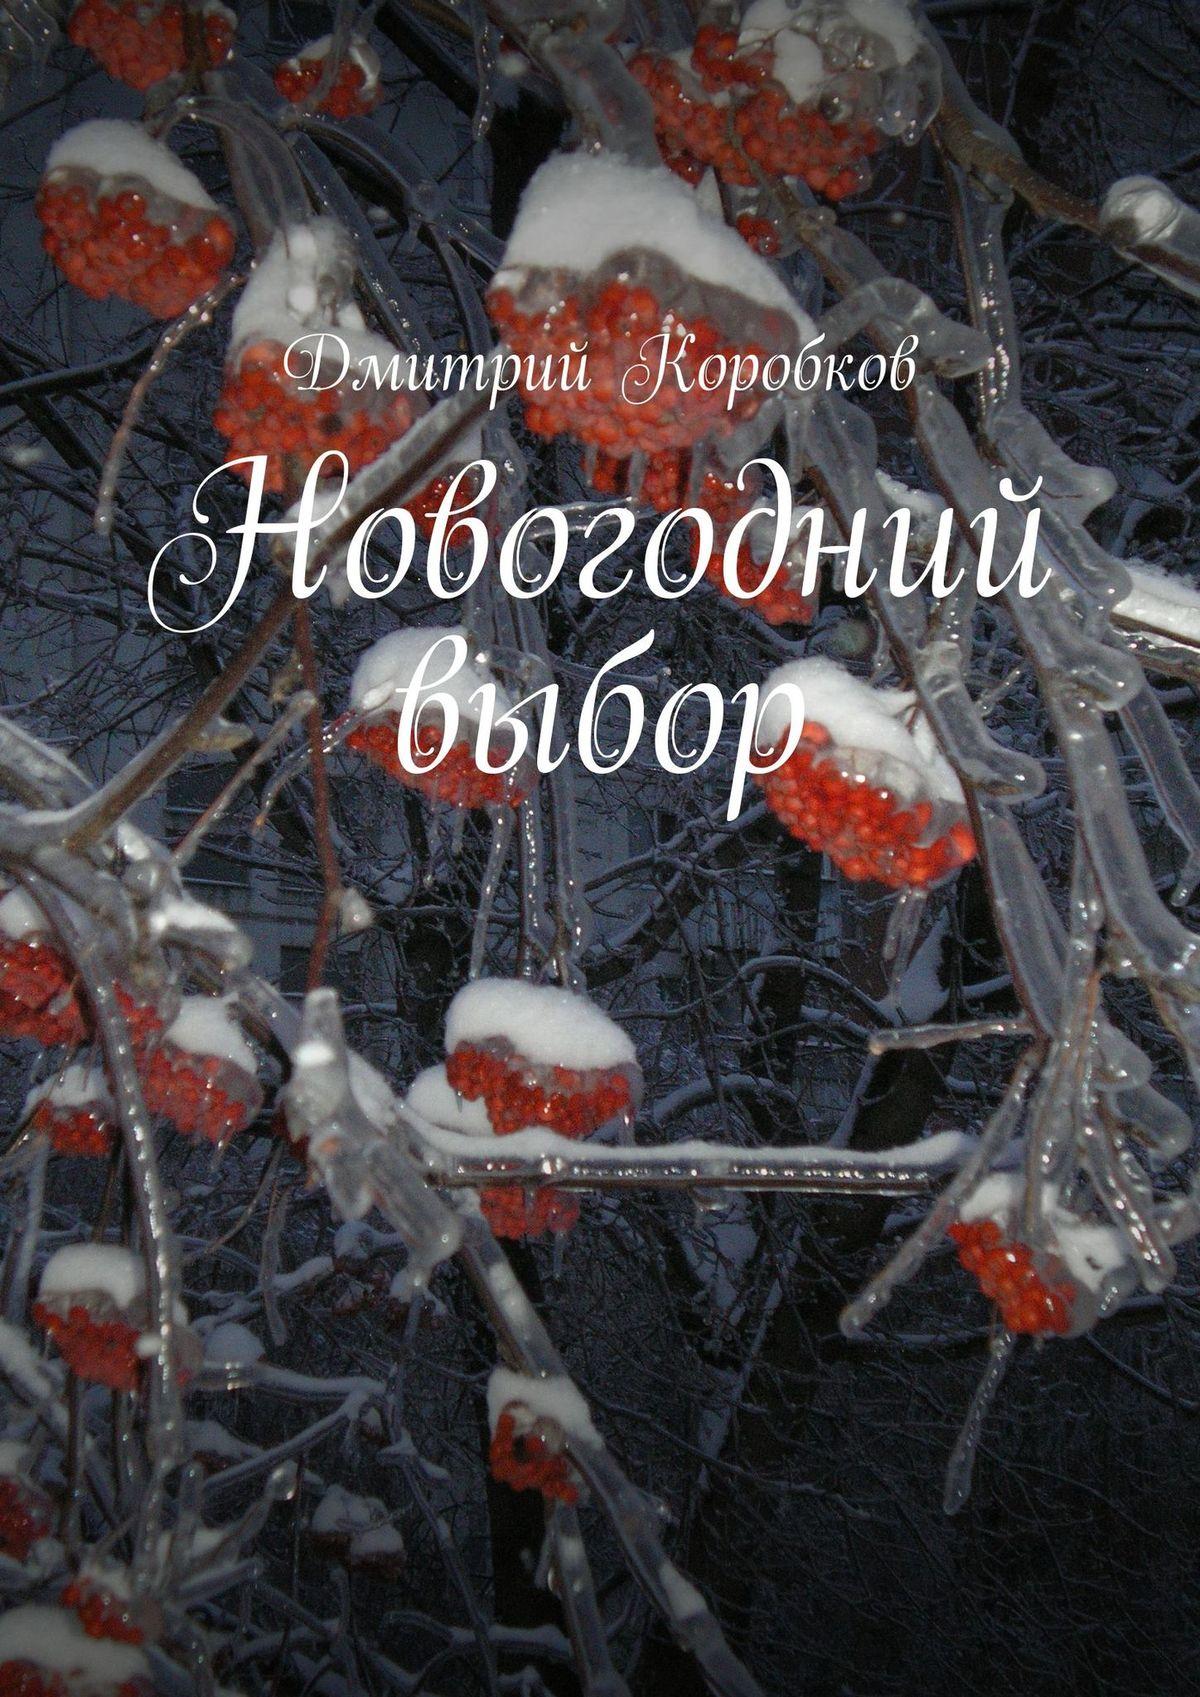 цены на Дмитрий Коробков Новогодний выбор